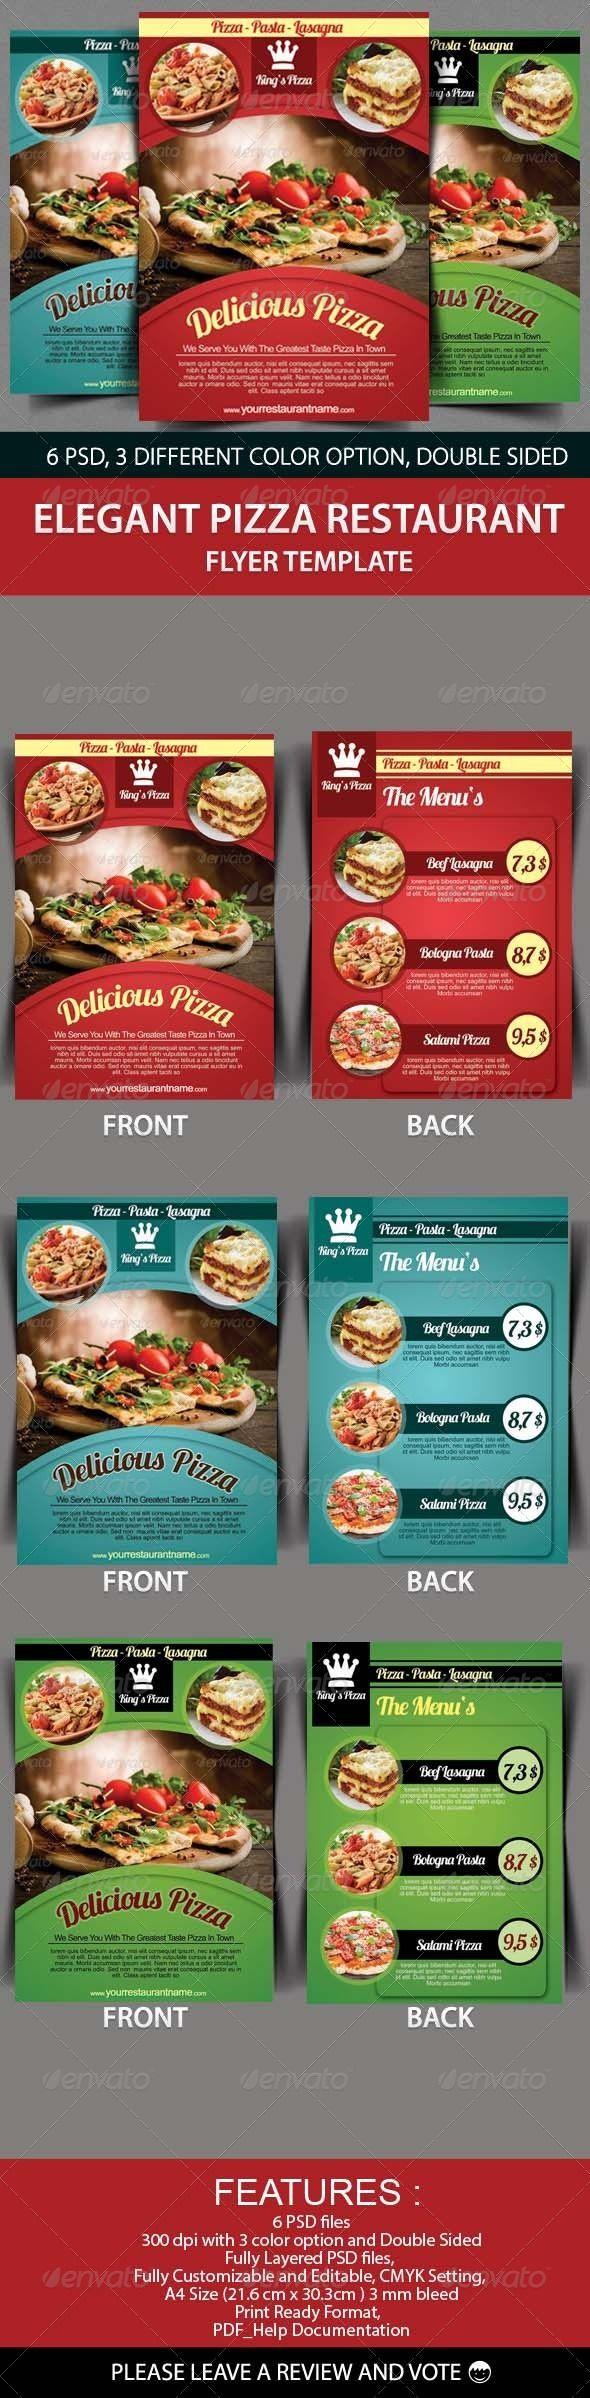 Elegant Pizza Restaurant Flyer Template   Folletos, Pizzería y ...